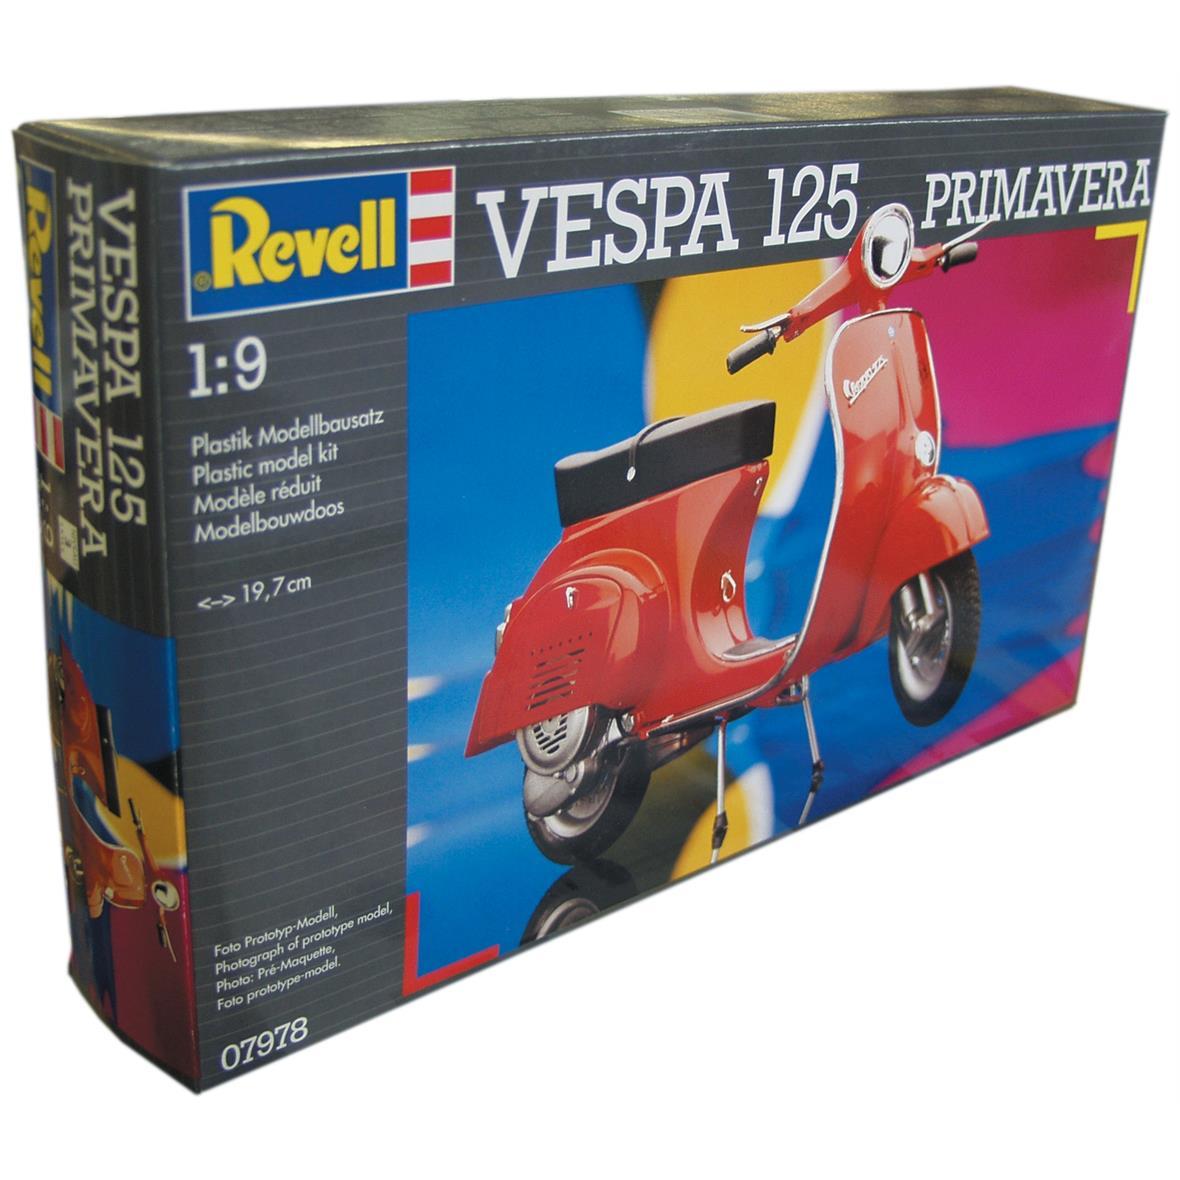 "Product Image for 'Model ""Vespa ET3/Primavera"",kit, scale 1:9Title'"